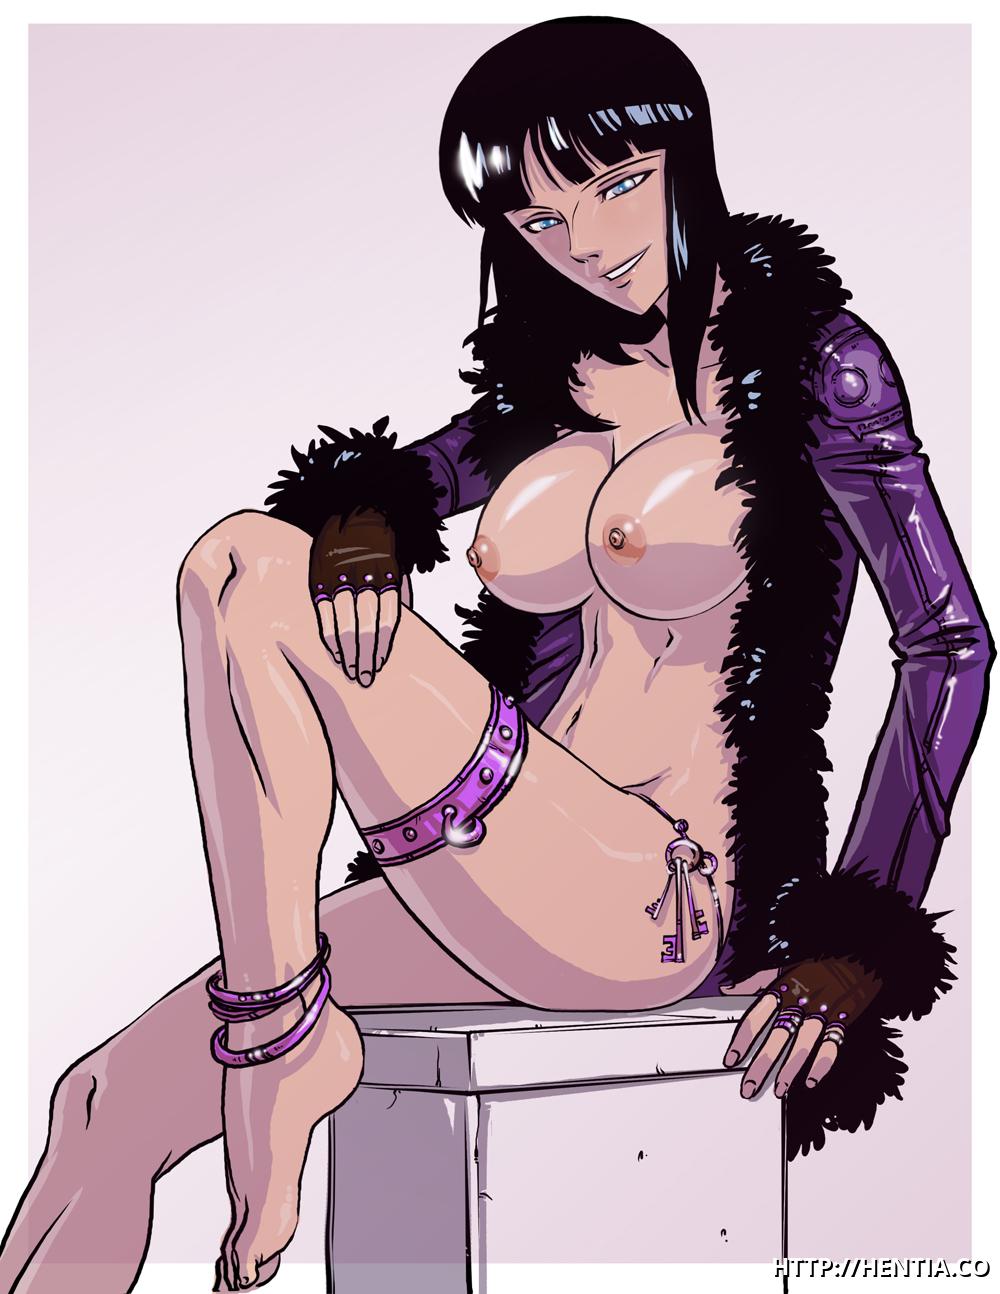 Sex mex latina